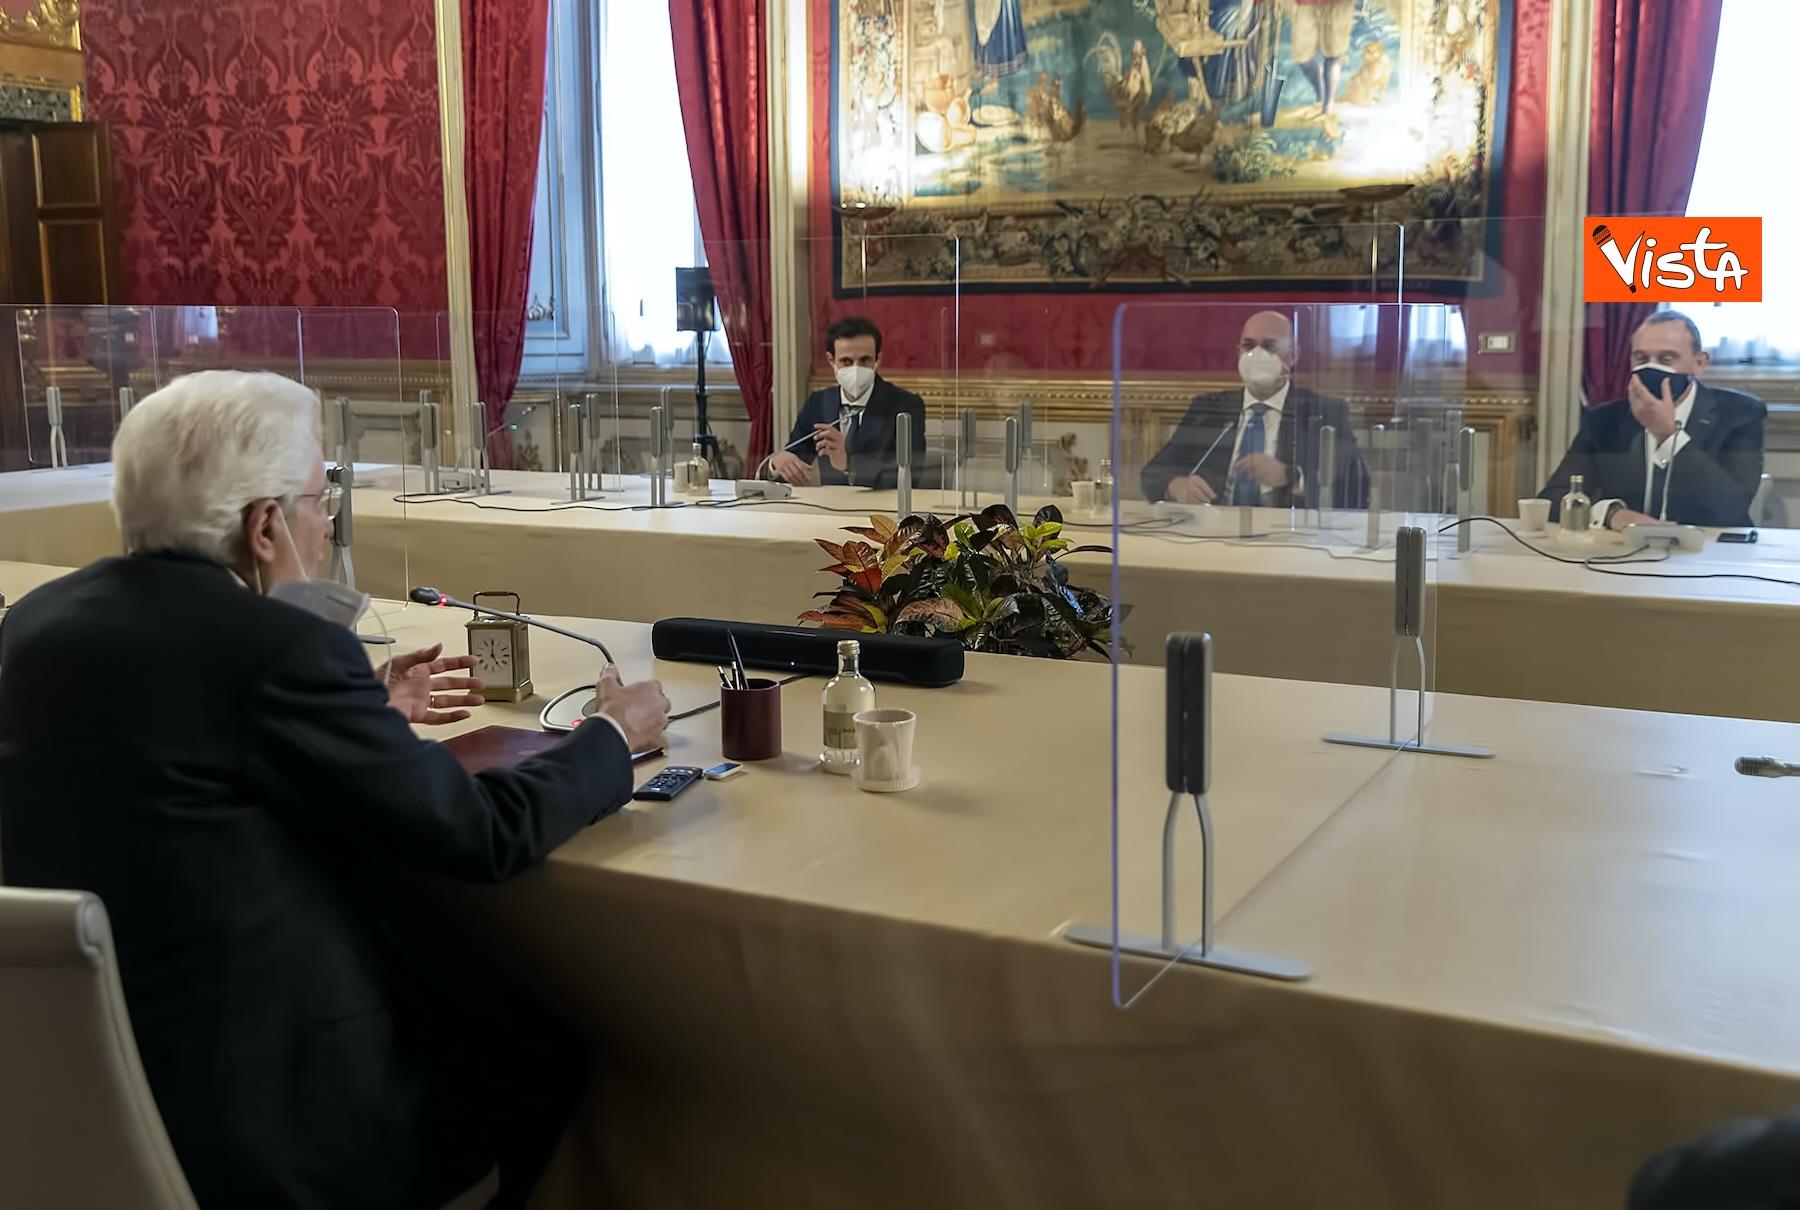 29-01 consultazioni crimi m5s italiani stufi dei teatrini